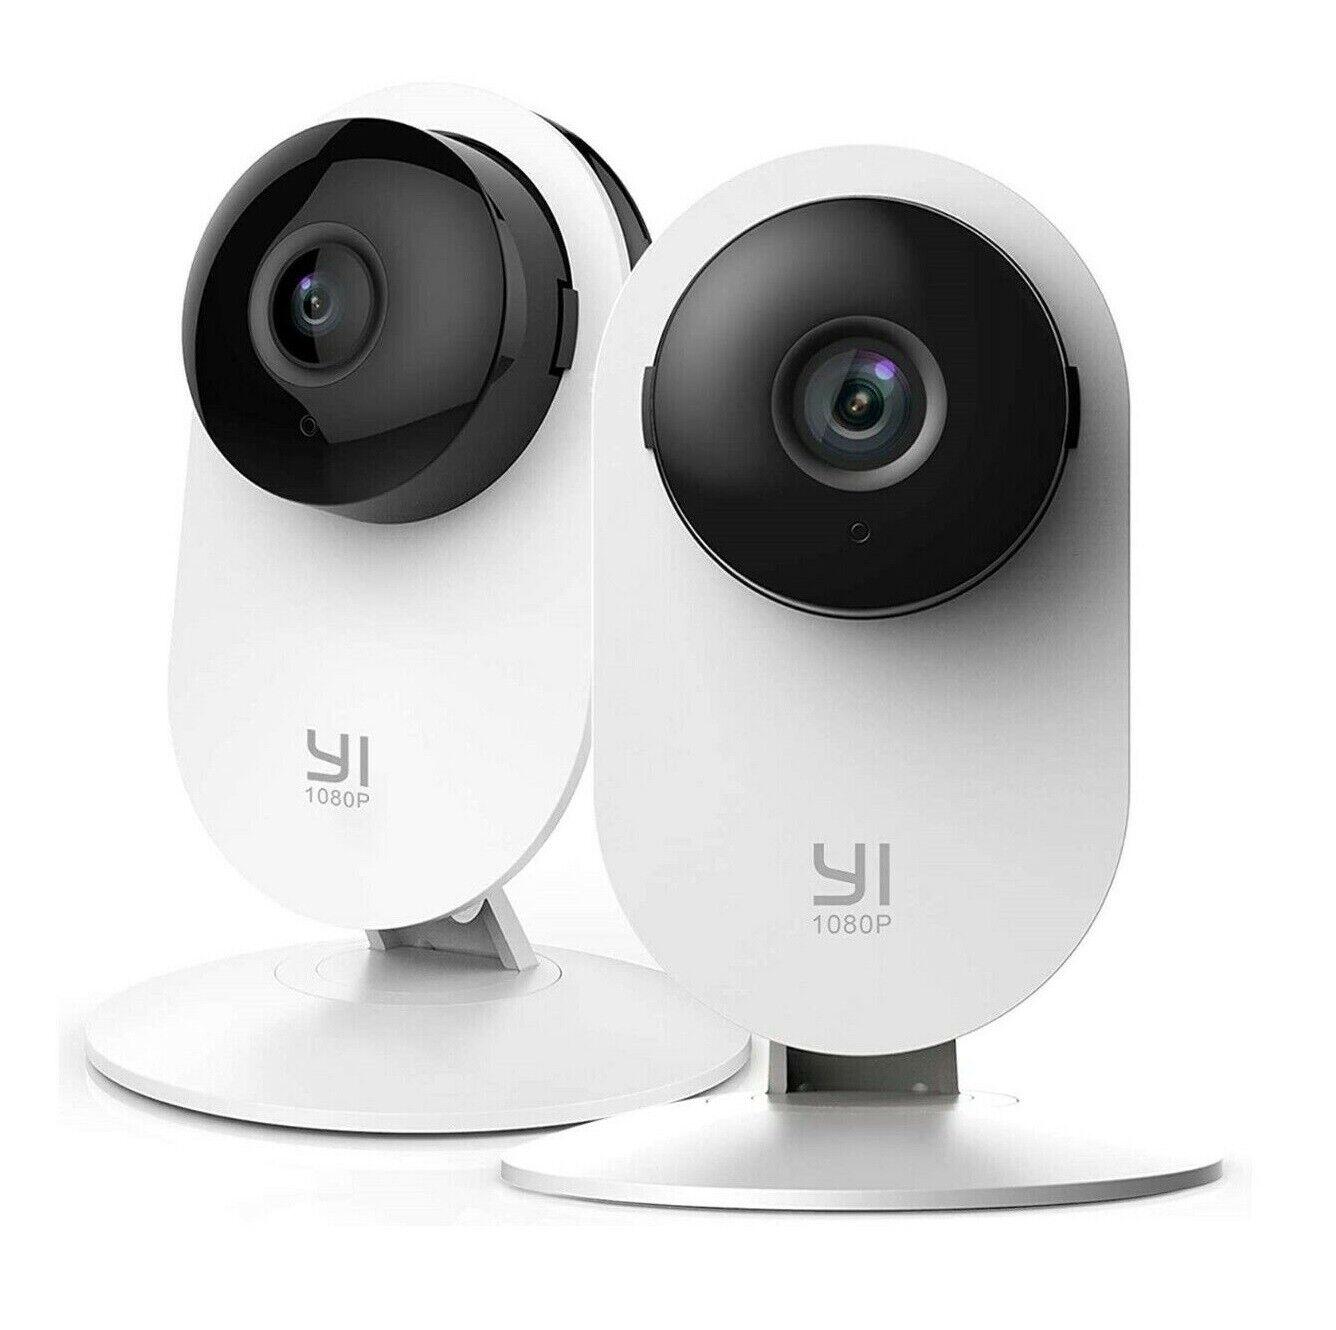 YI 2pc Home Camera 1080p Wireless IP Security Surveillance S